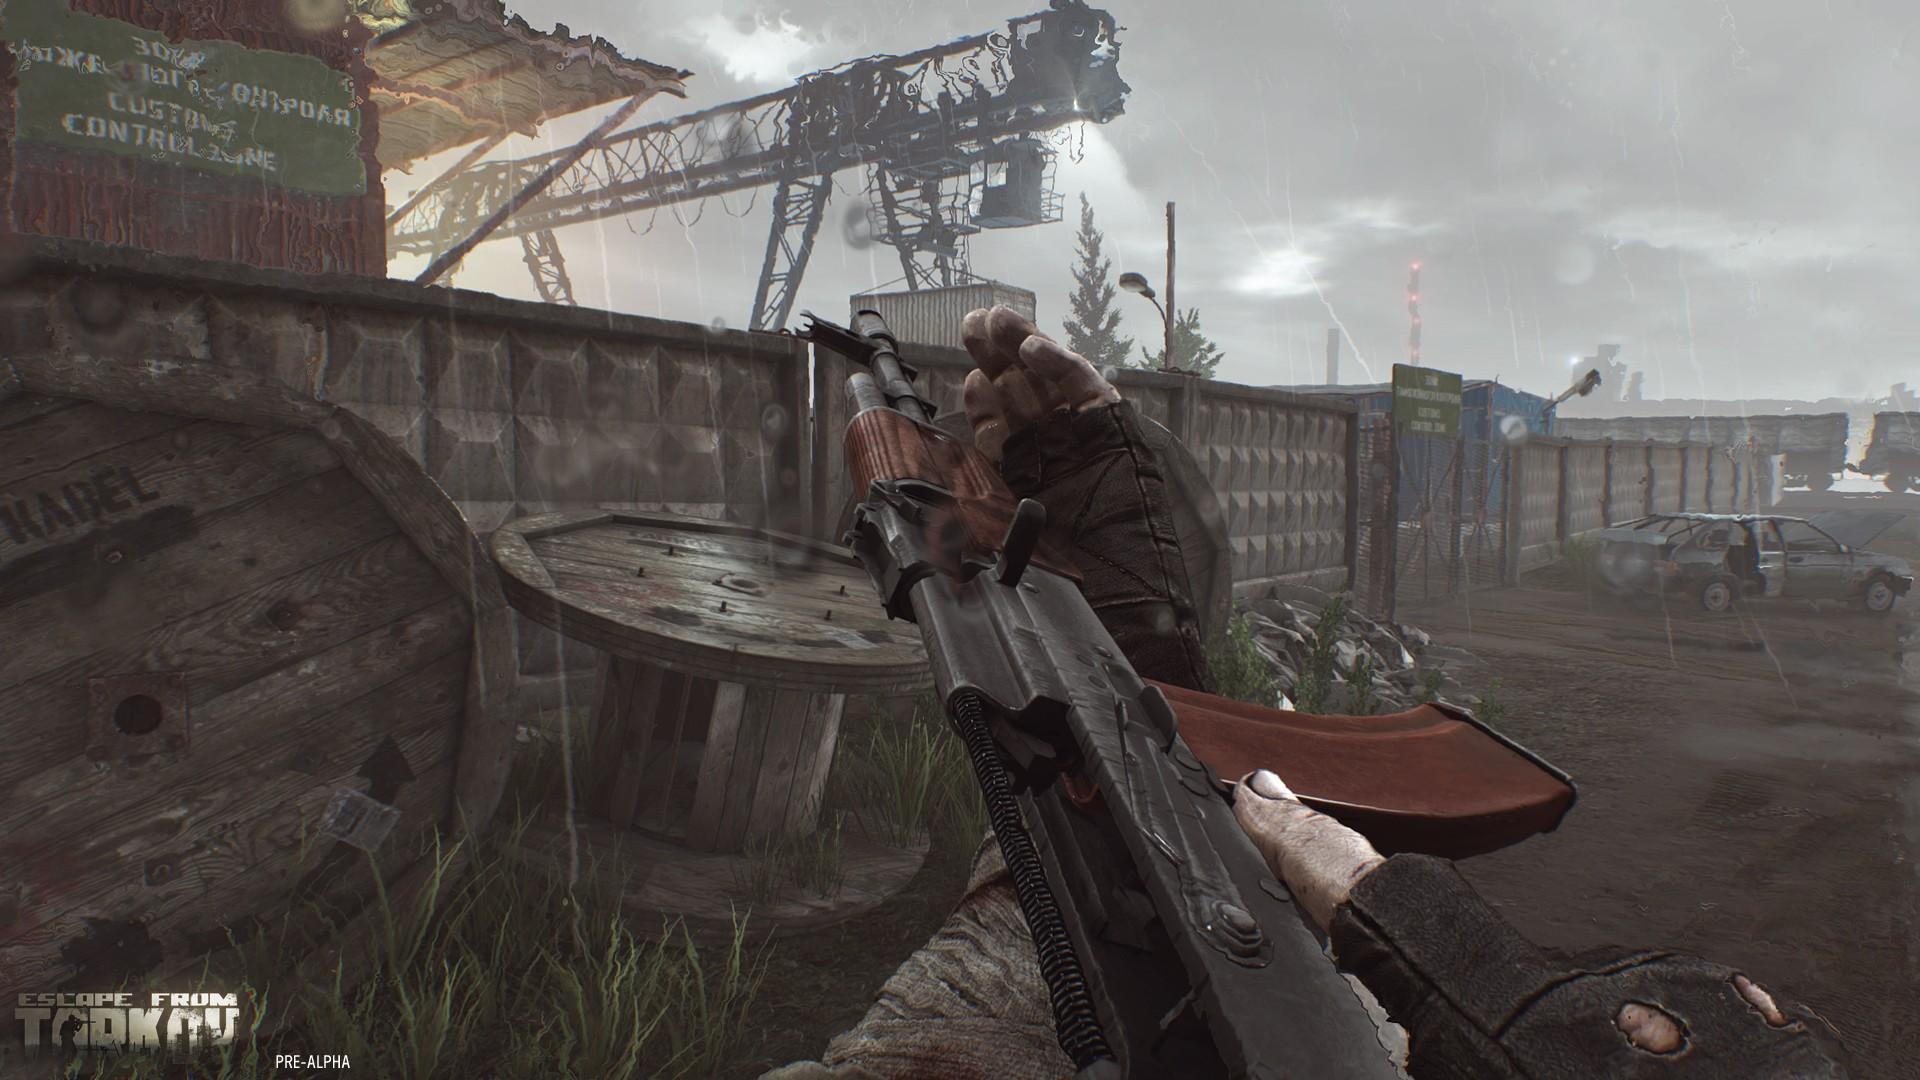 Wallpaper : video games, soldier, Escape from Tarkov, War